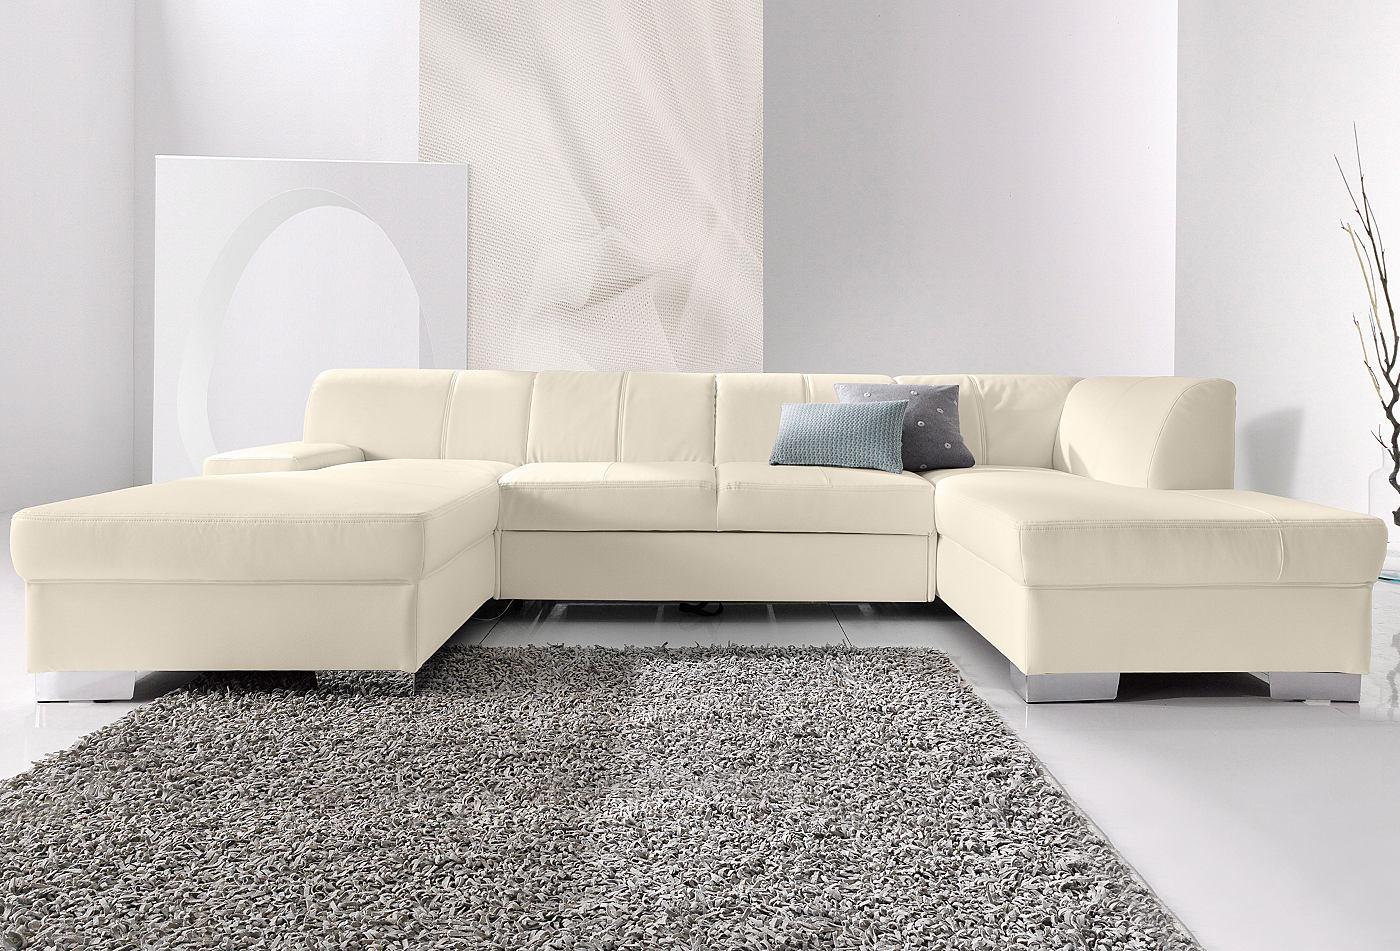 hoekbank chaise longue leer. Black Bedroom Furniture Sets. Home Design Ideas